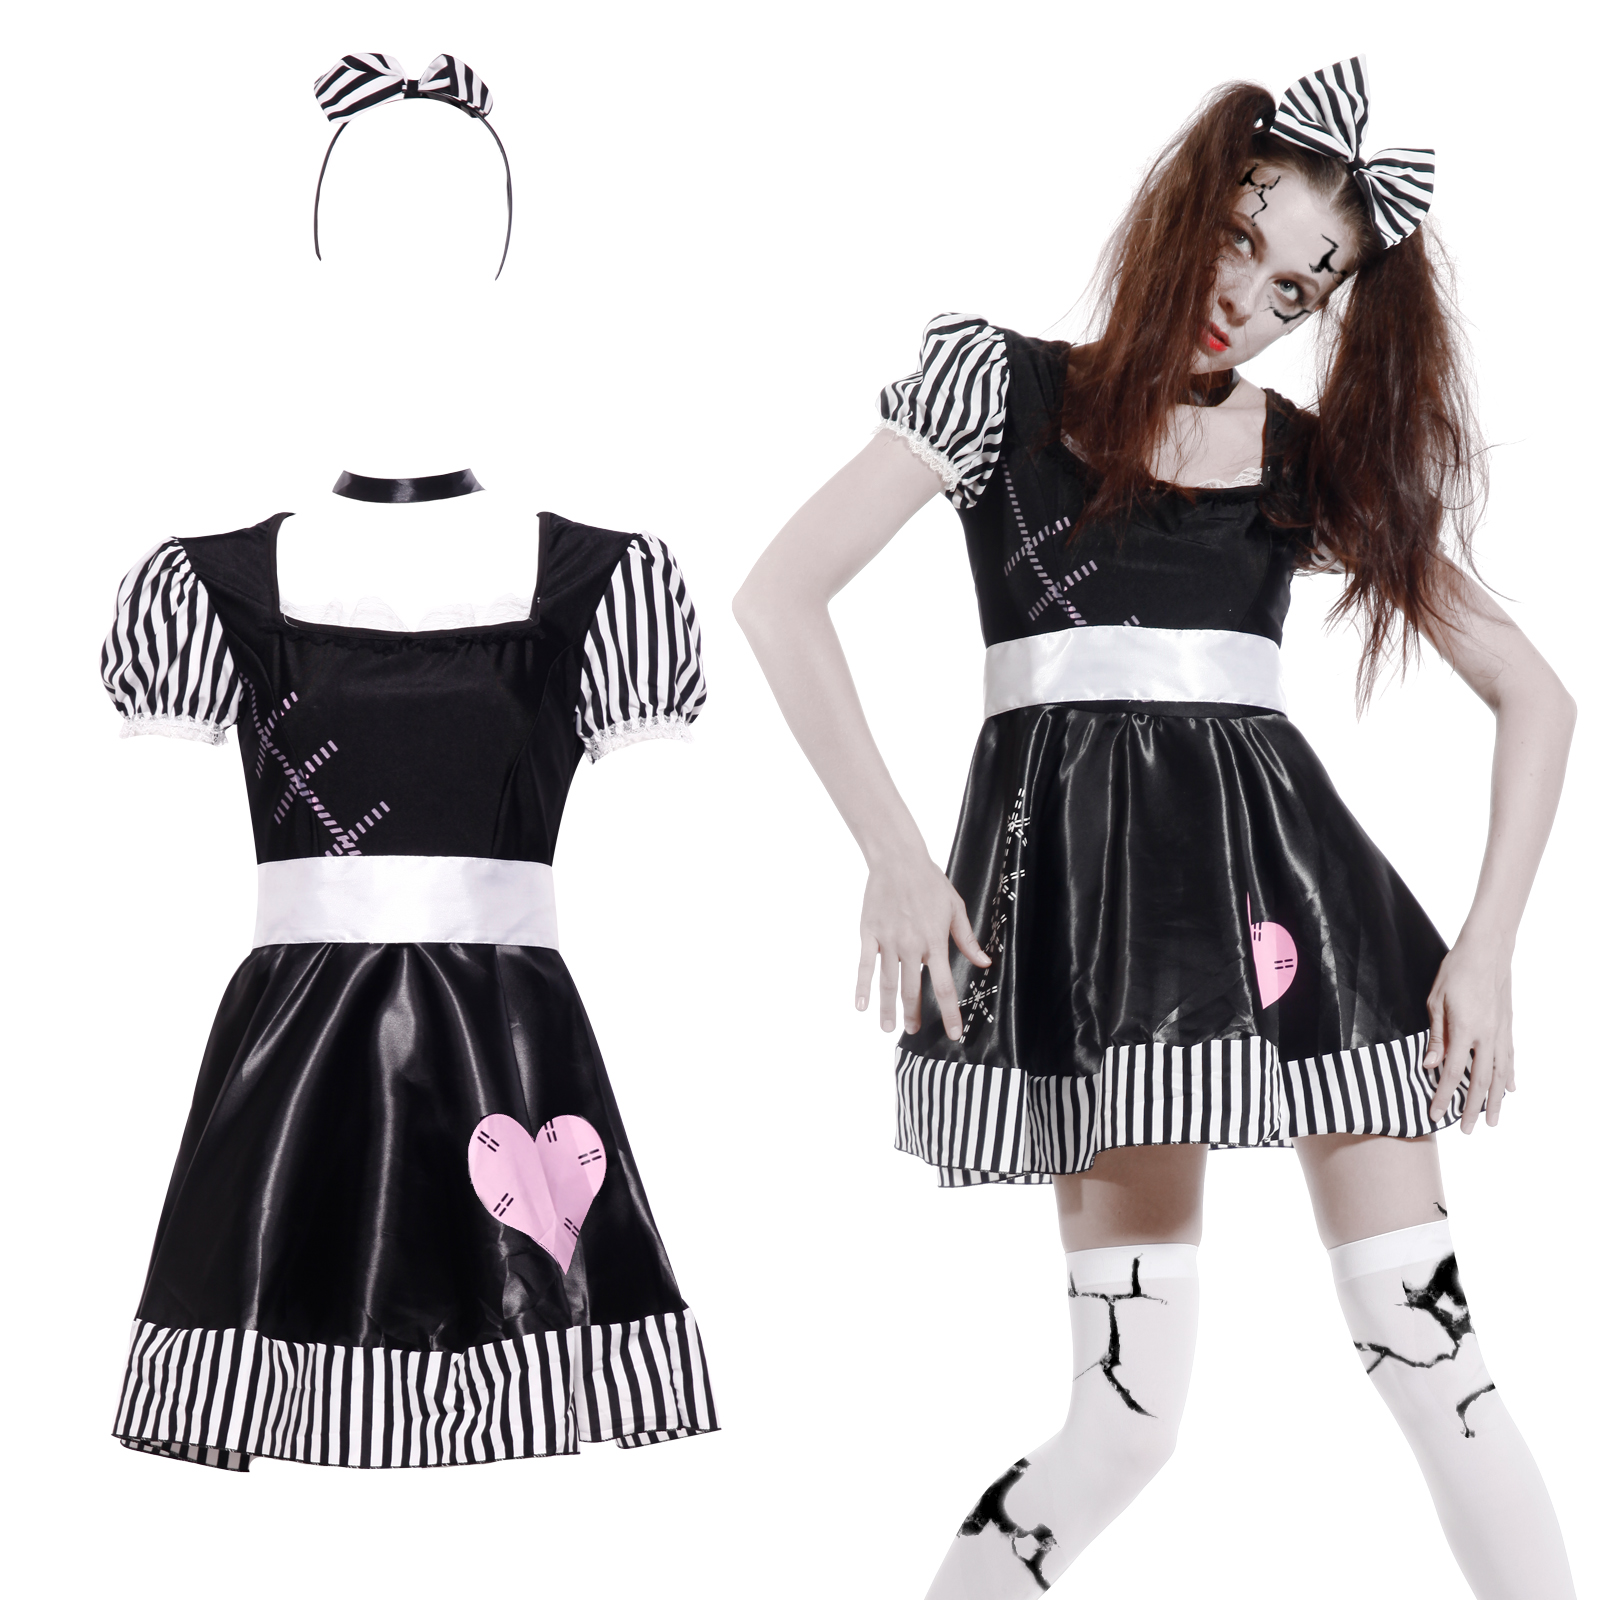 halloween zombiekleid horror zombie geister kost m puppen doll mit haargreif ebay. Black Bedroom Furniture Sets. Home Design Ideas